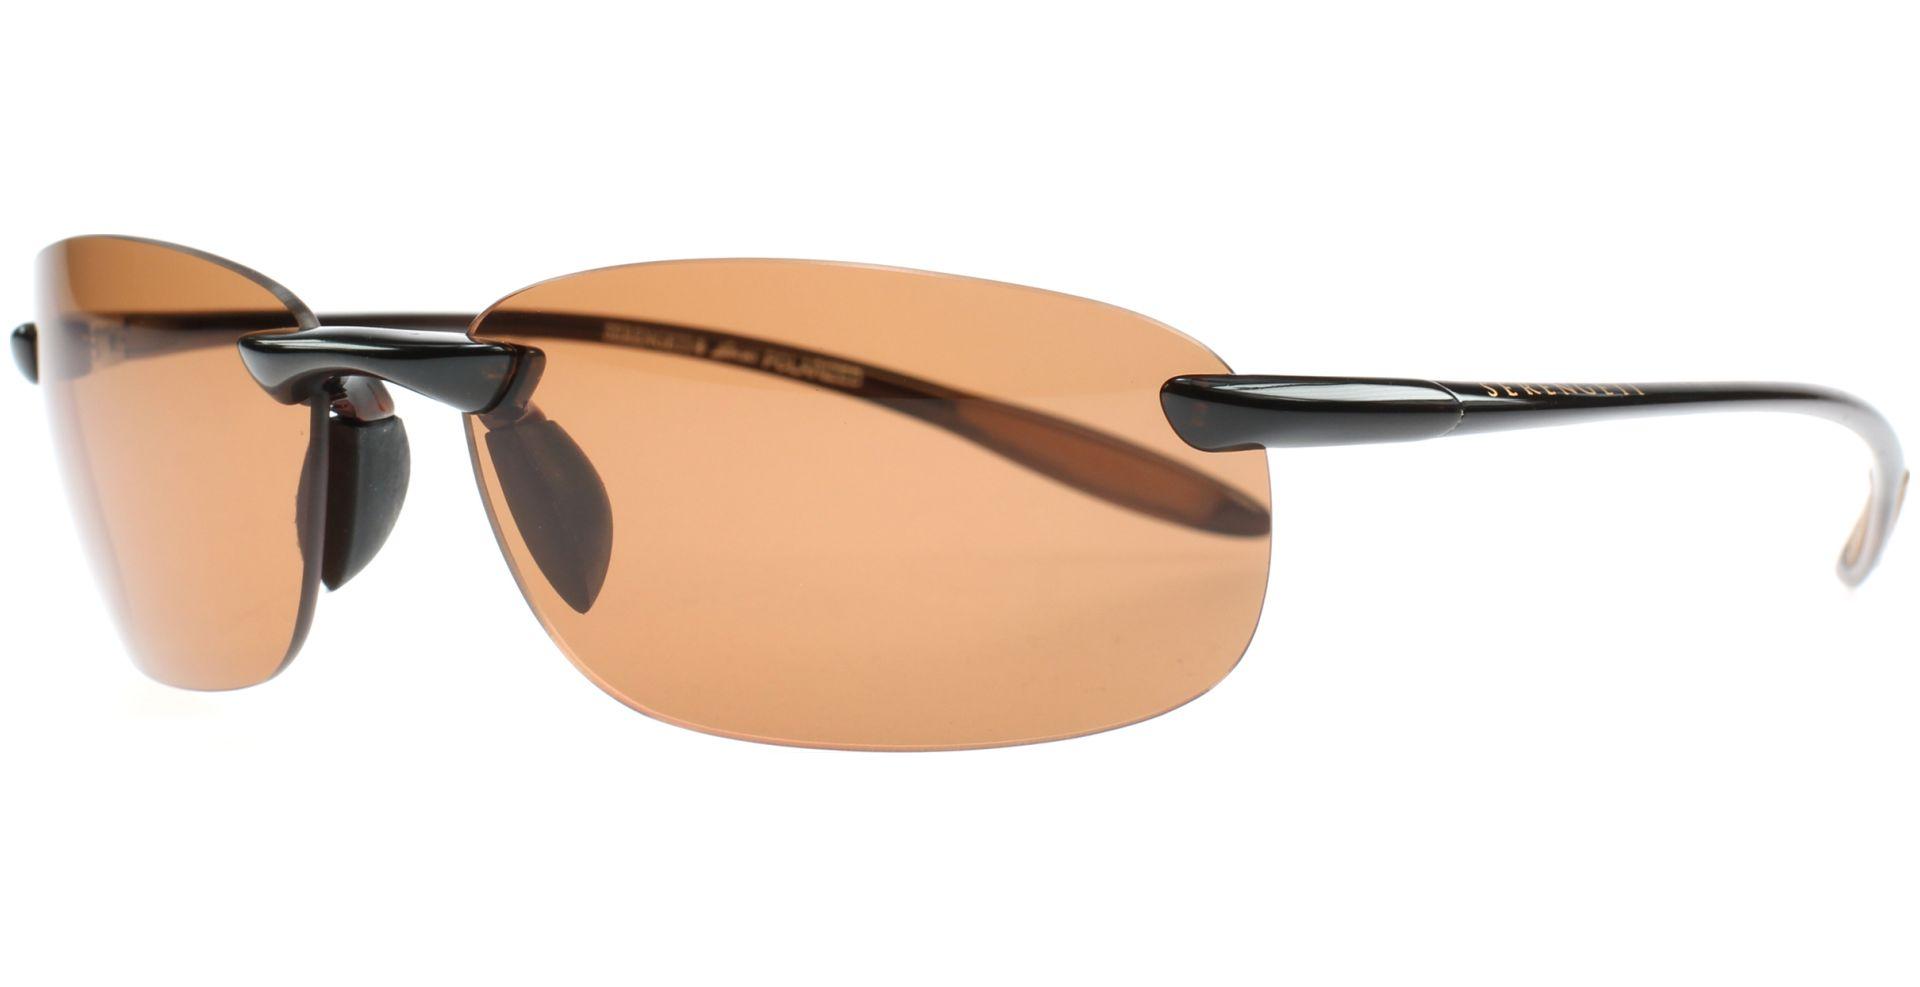 Serengeti Eyewear Sonnenbrille Nuvola, Shiny Brown, M, 7360